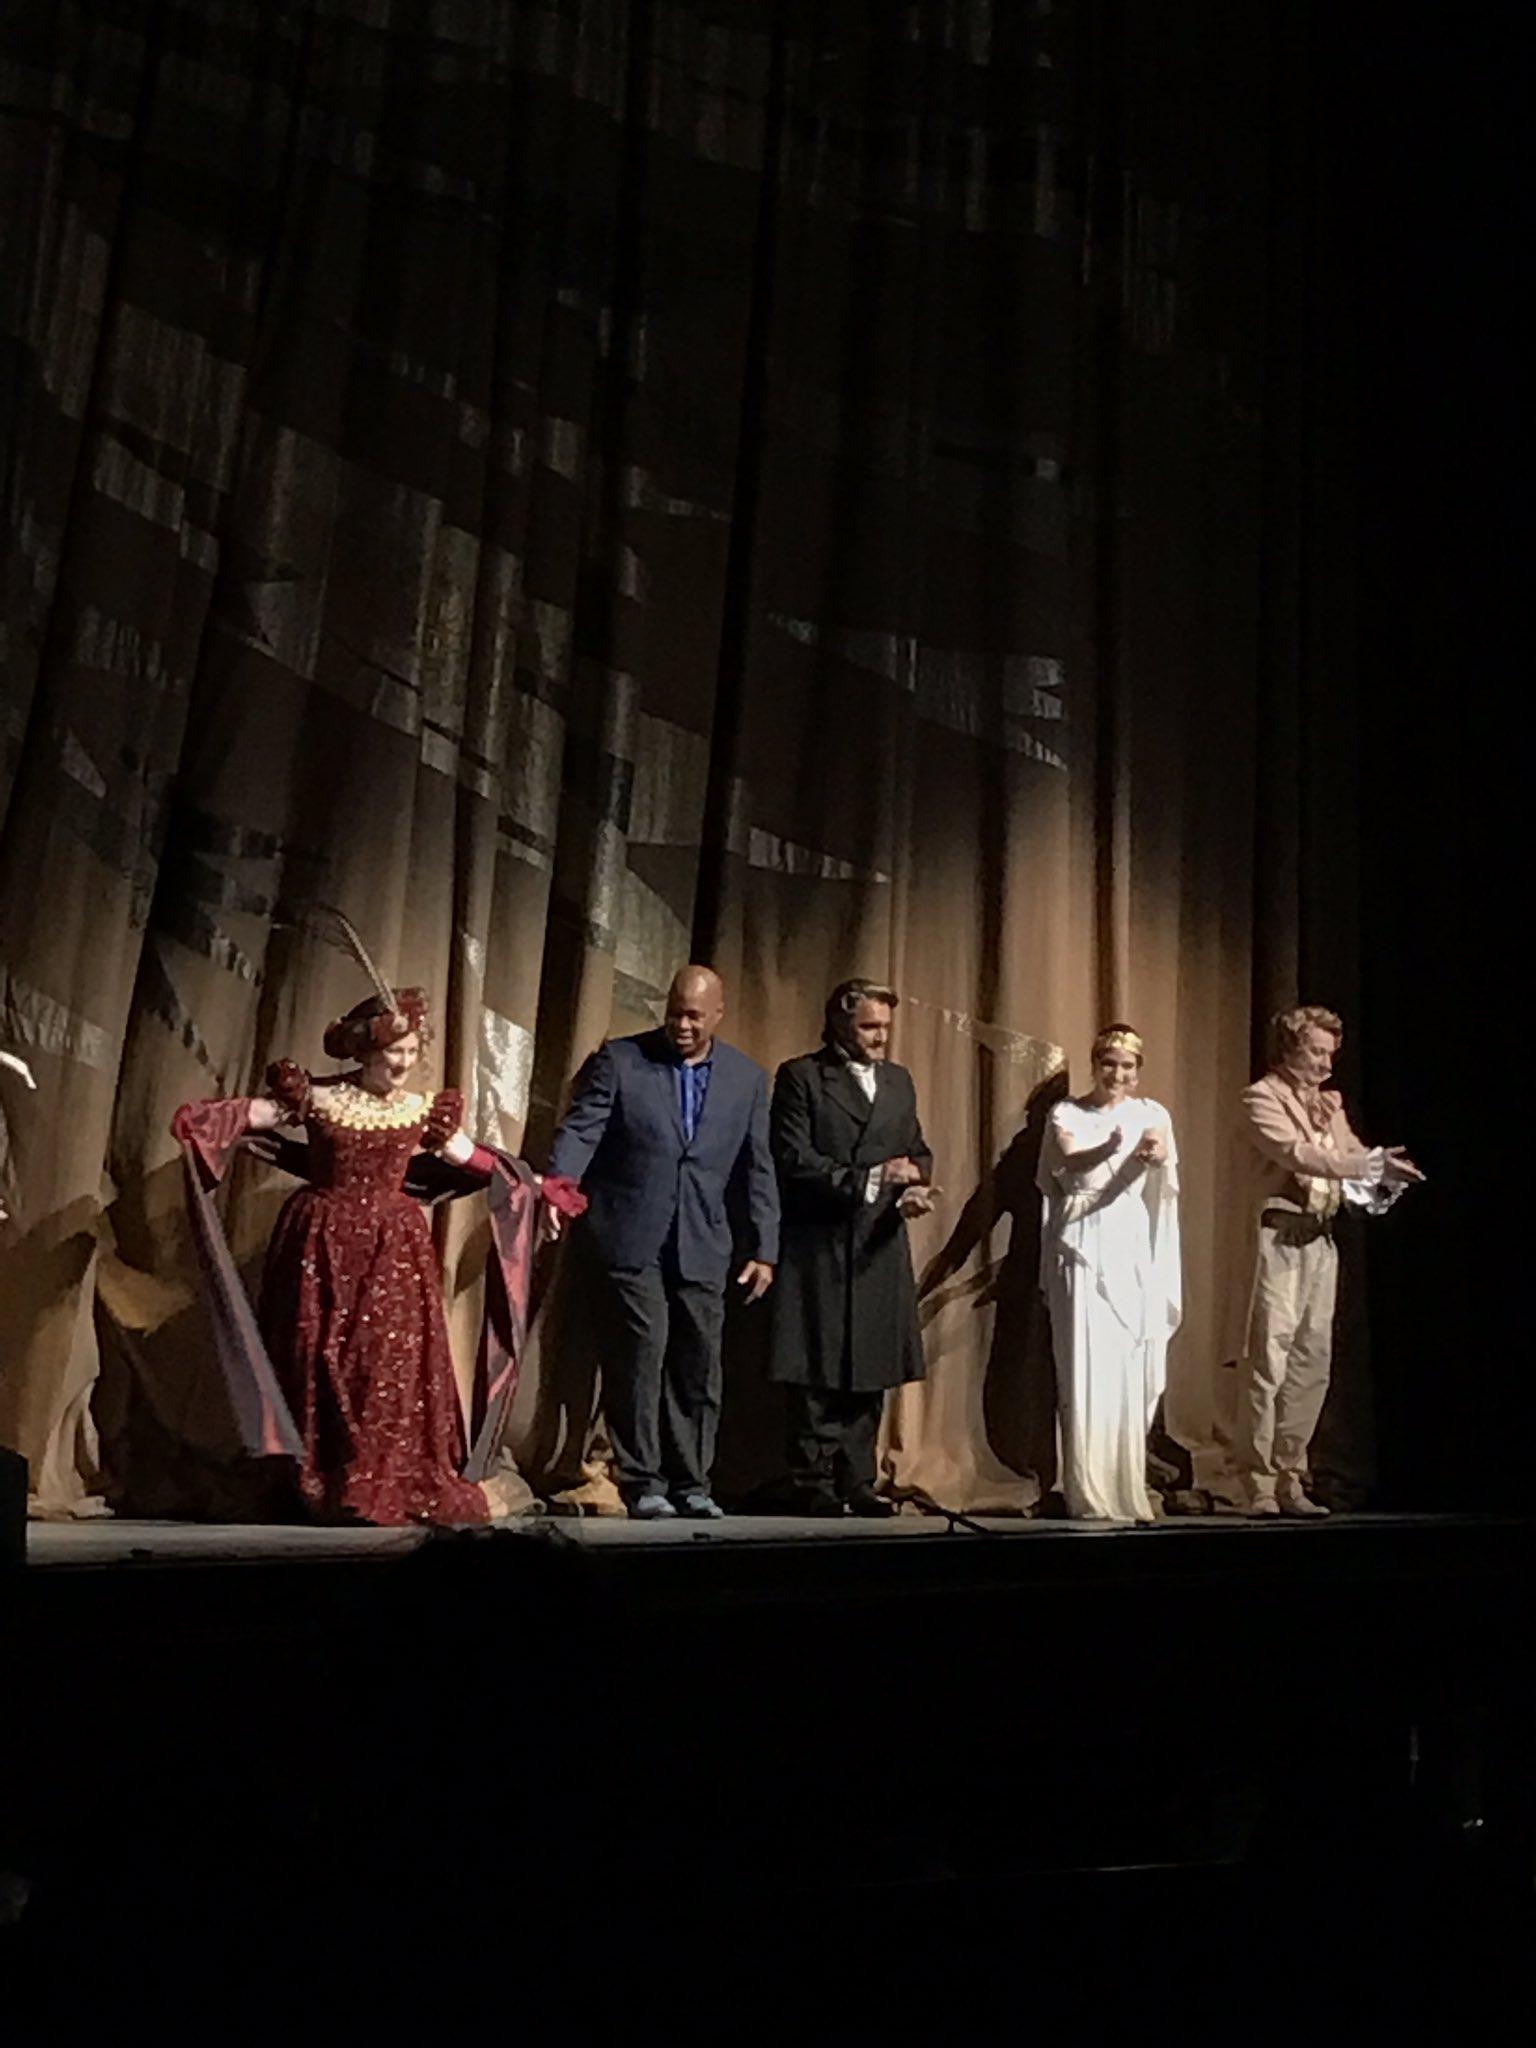 Bravo!   @LAOpera go see this opera!!! https://t.co/x4bqY7Zw4p